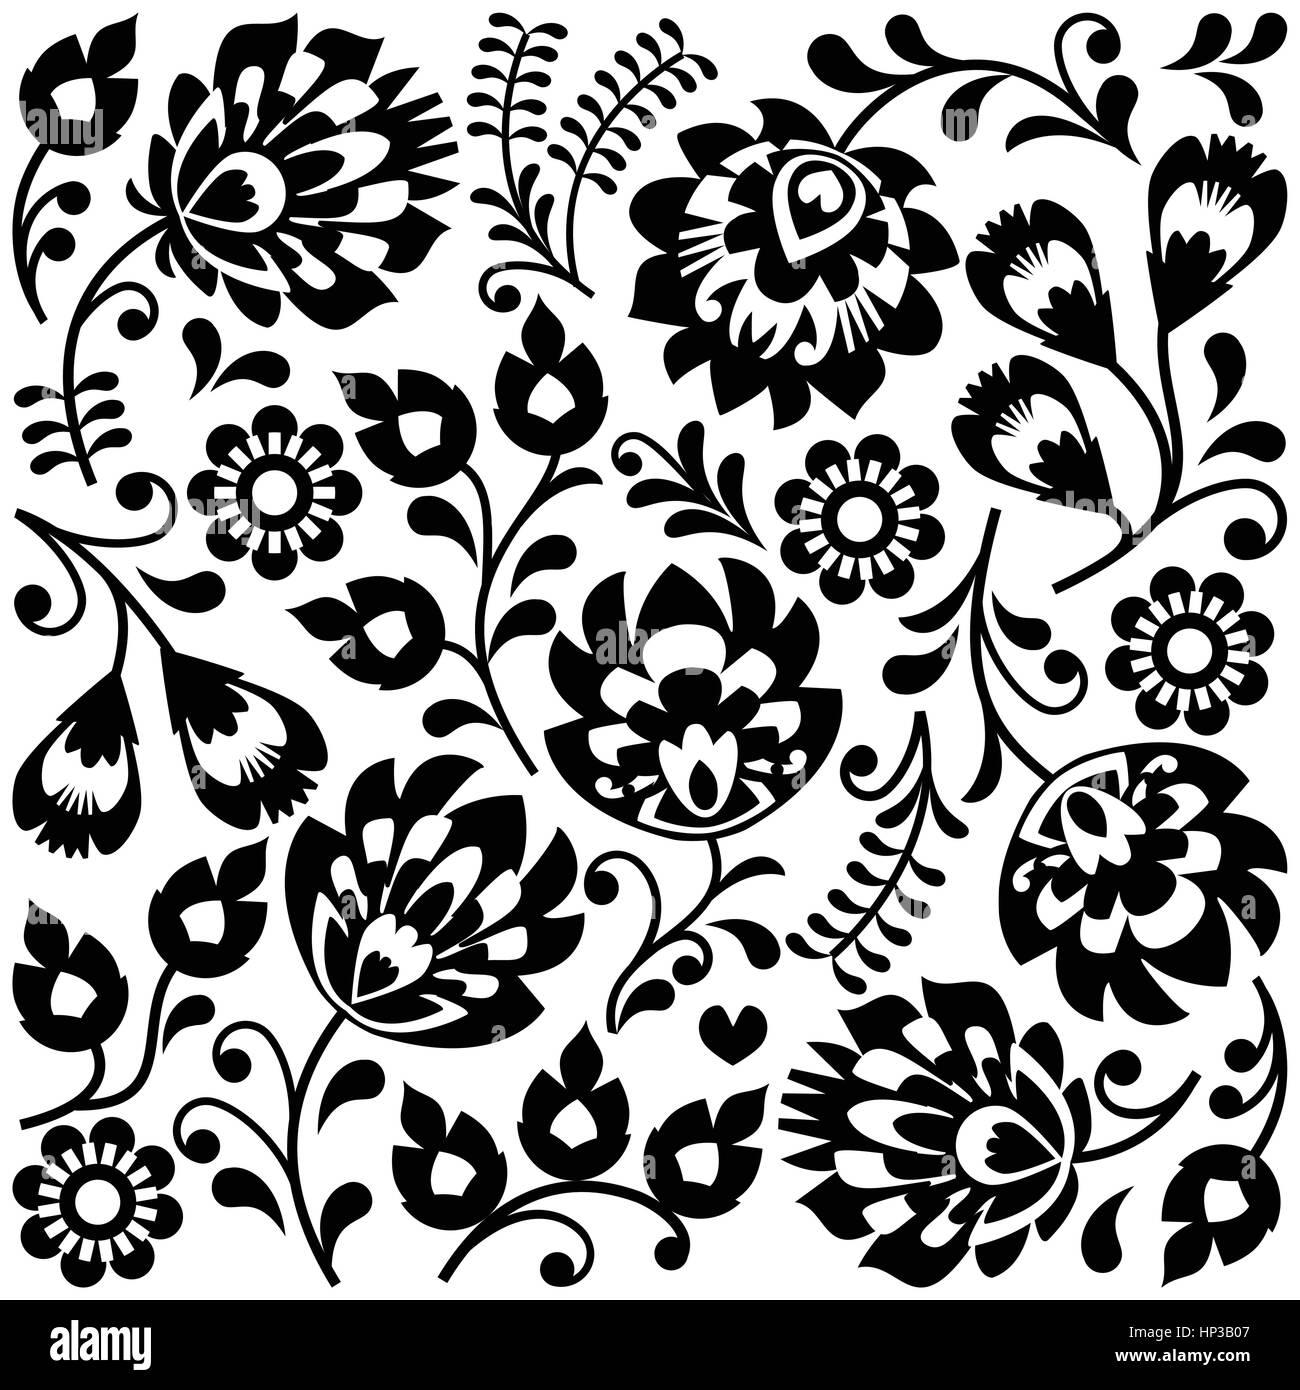 Polish folk art black pattern - Wzory Lowickie, Wycinanki. Traditional monochrome background - Slavic cutout style - Stock Image